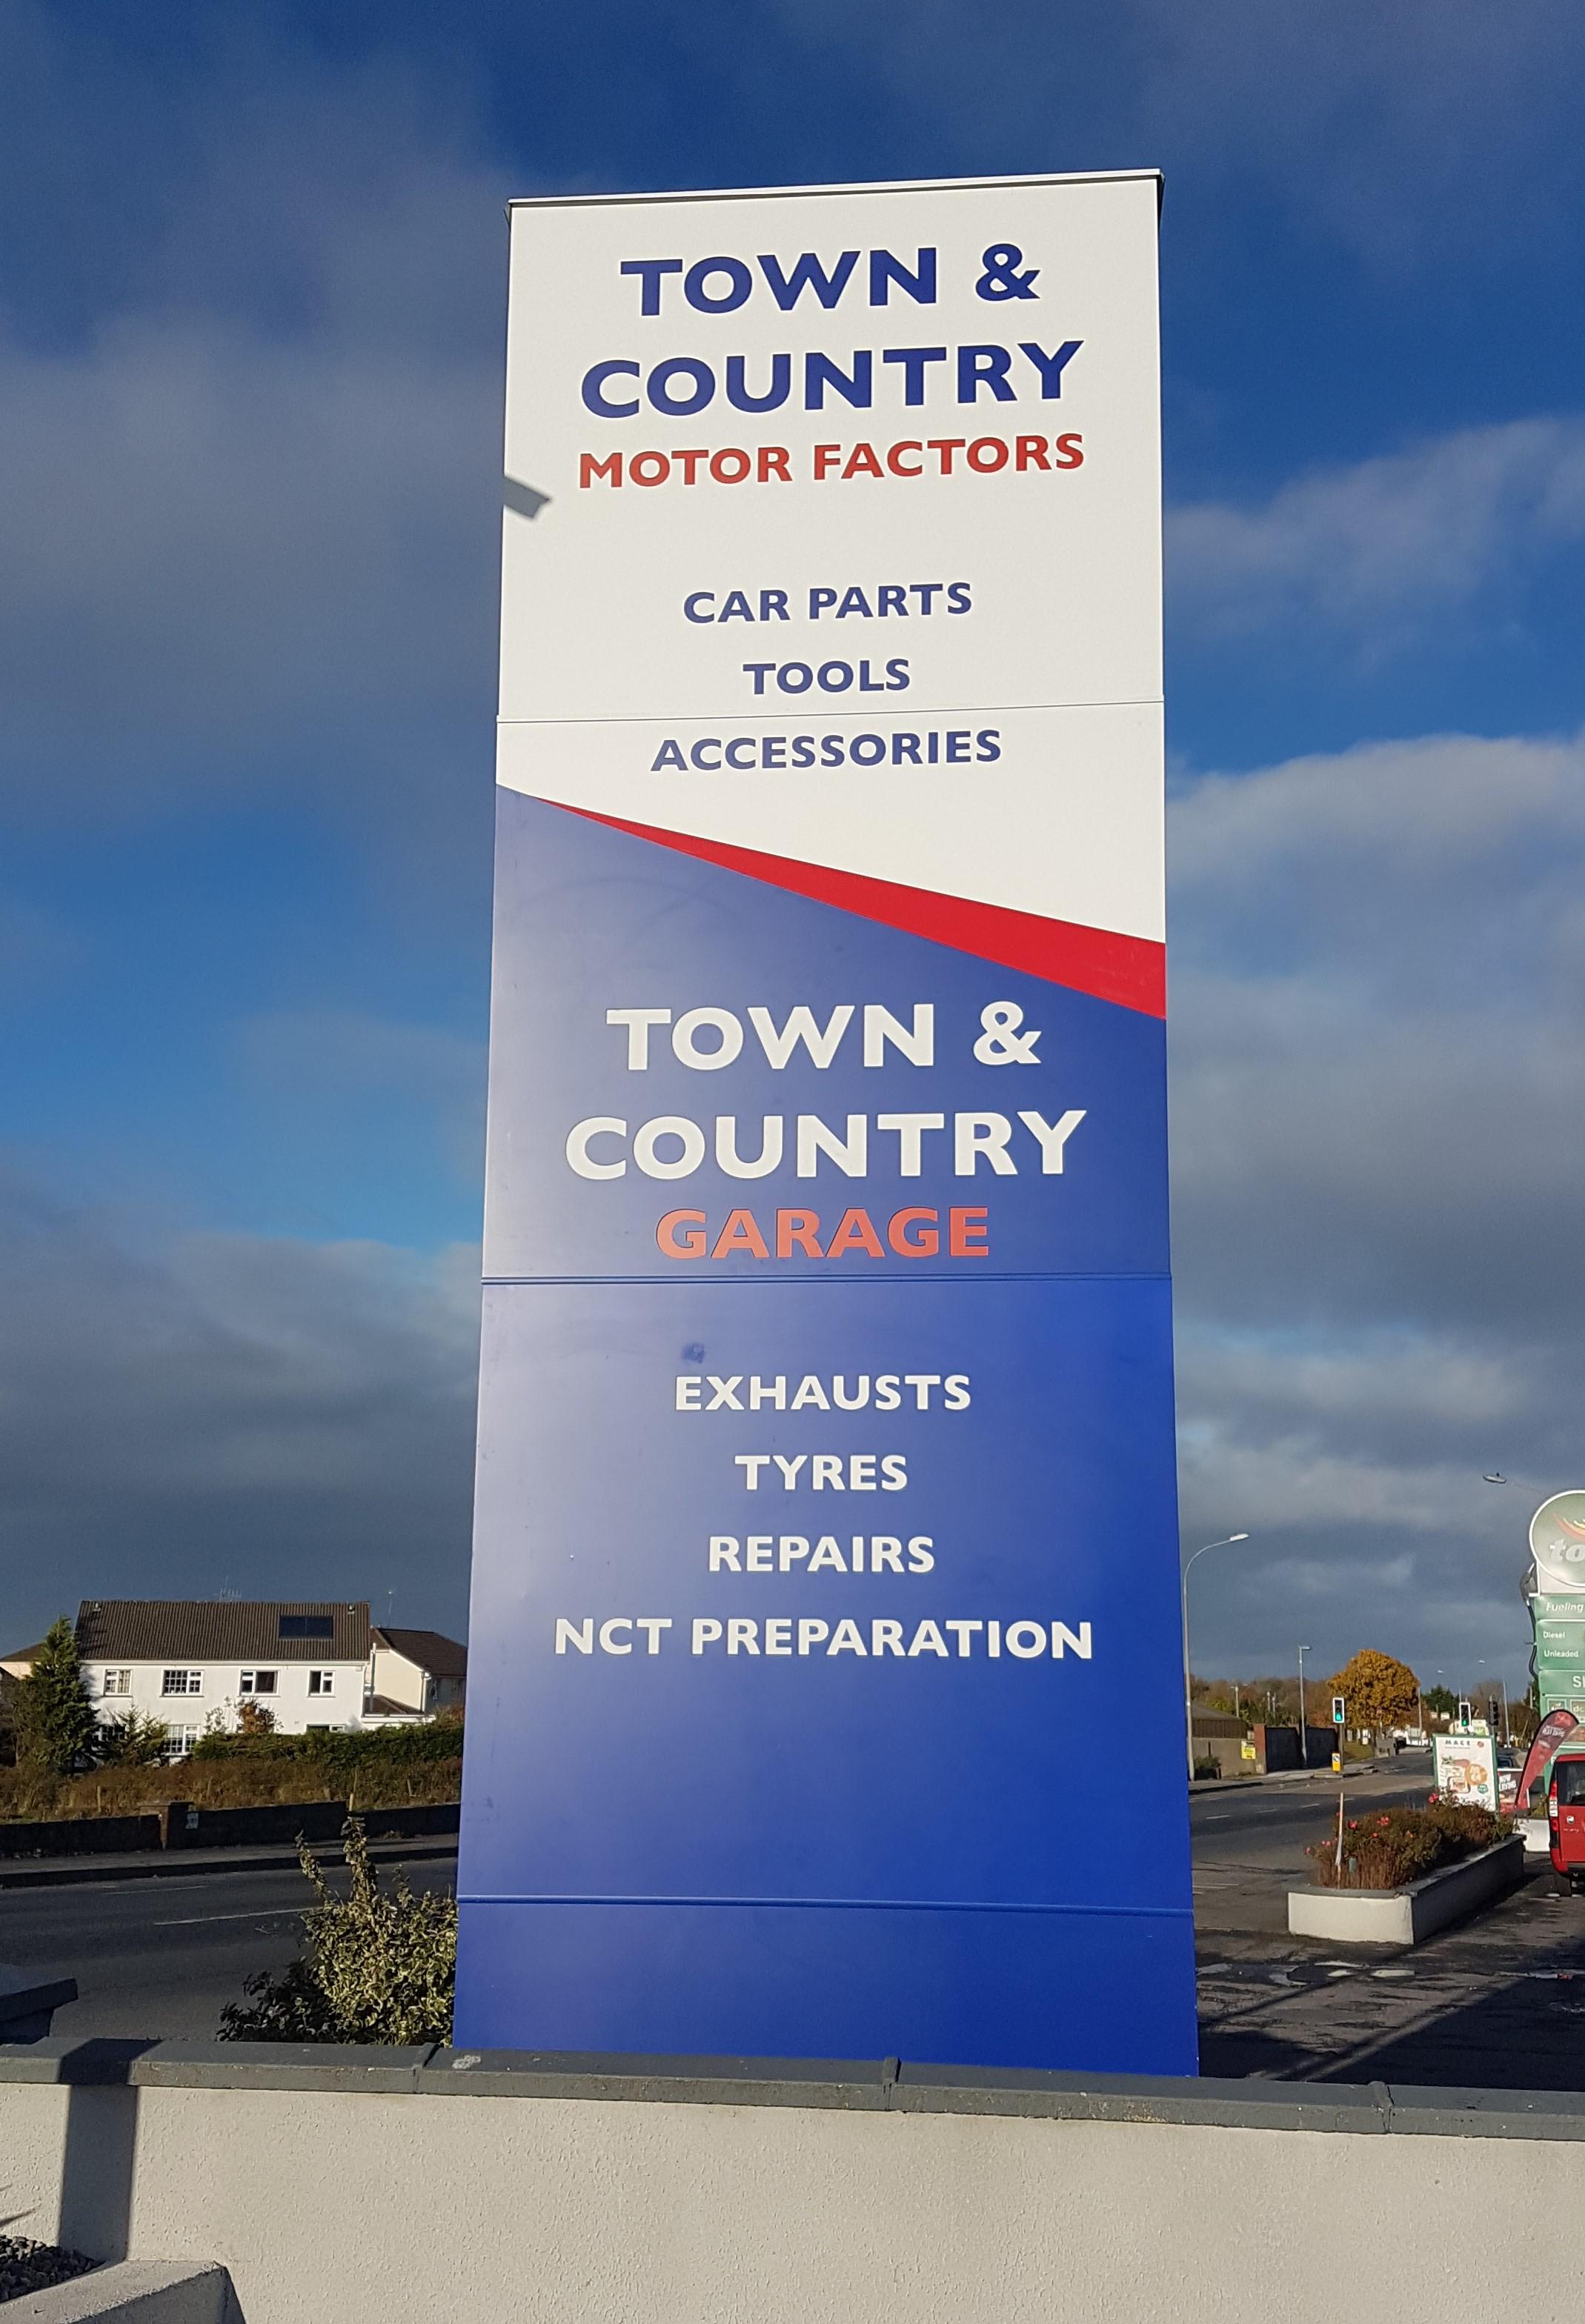 Town & Country Motor Factors, Tuam